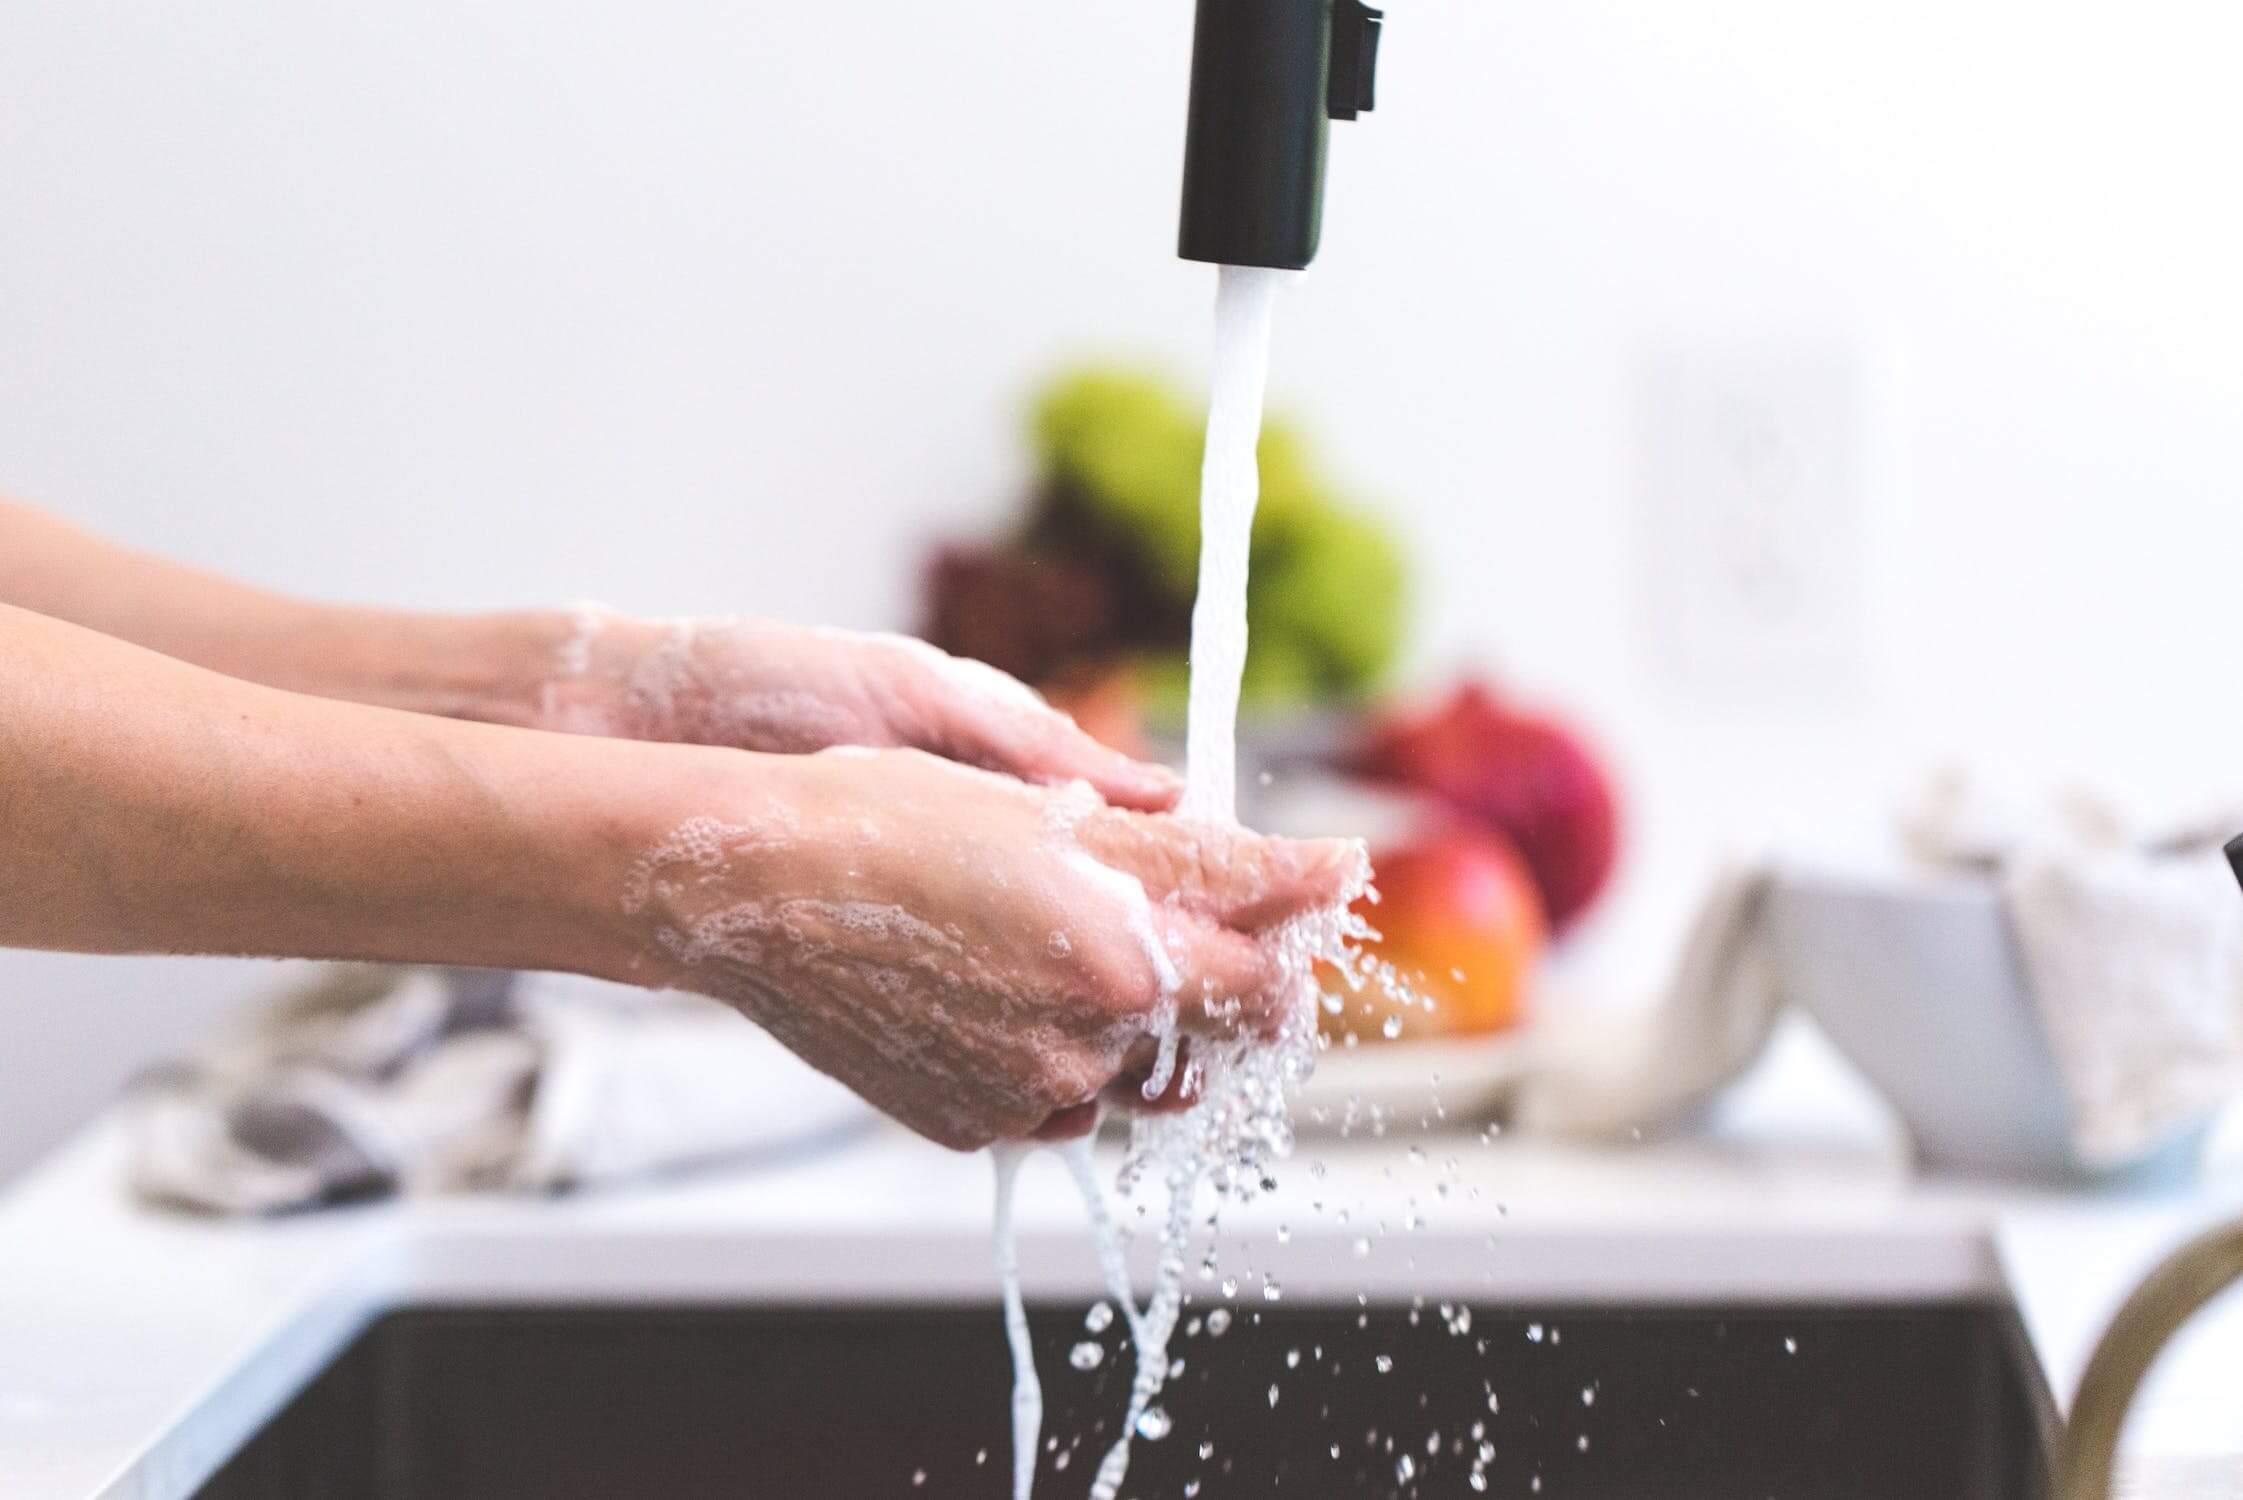 An individual washing their hands.